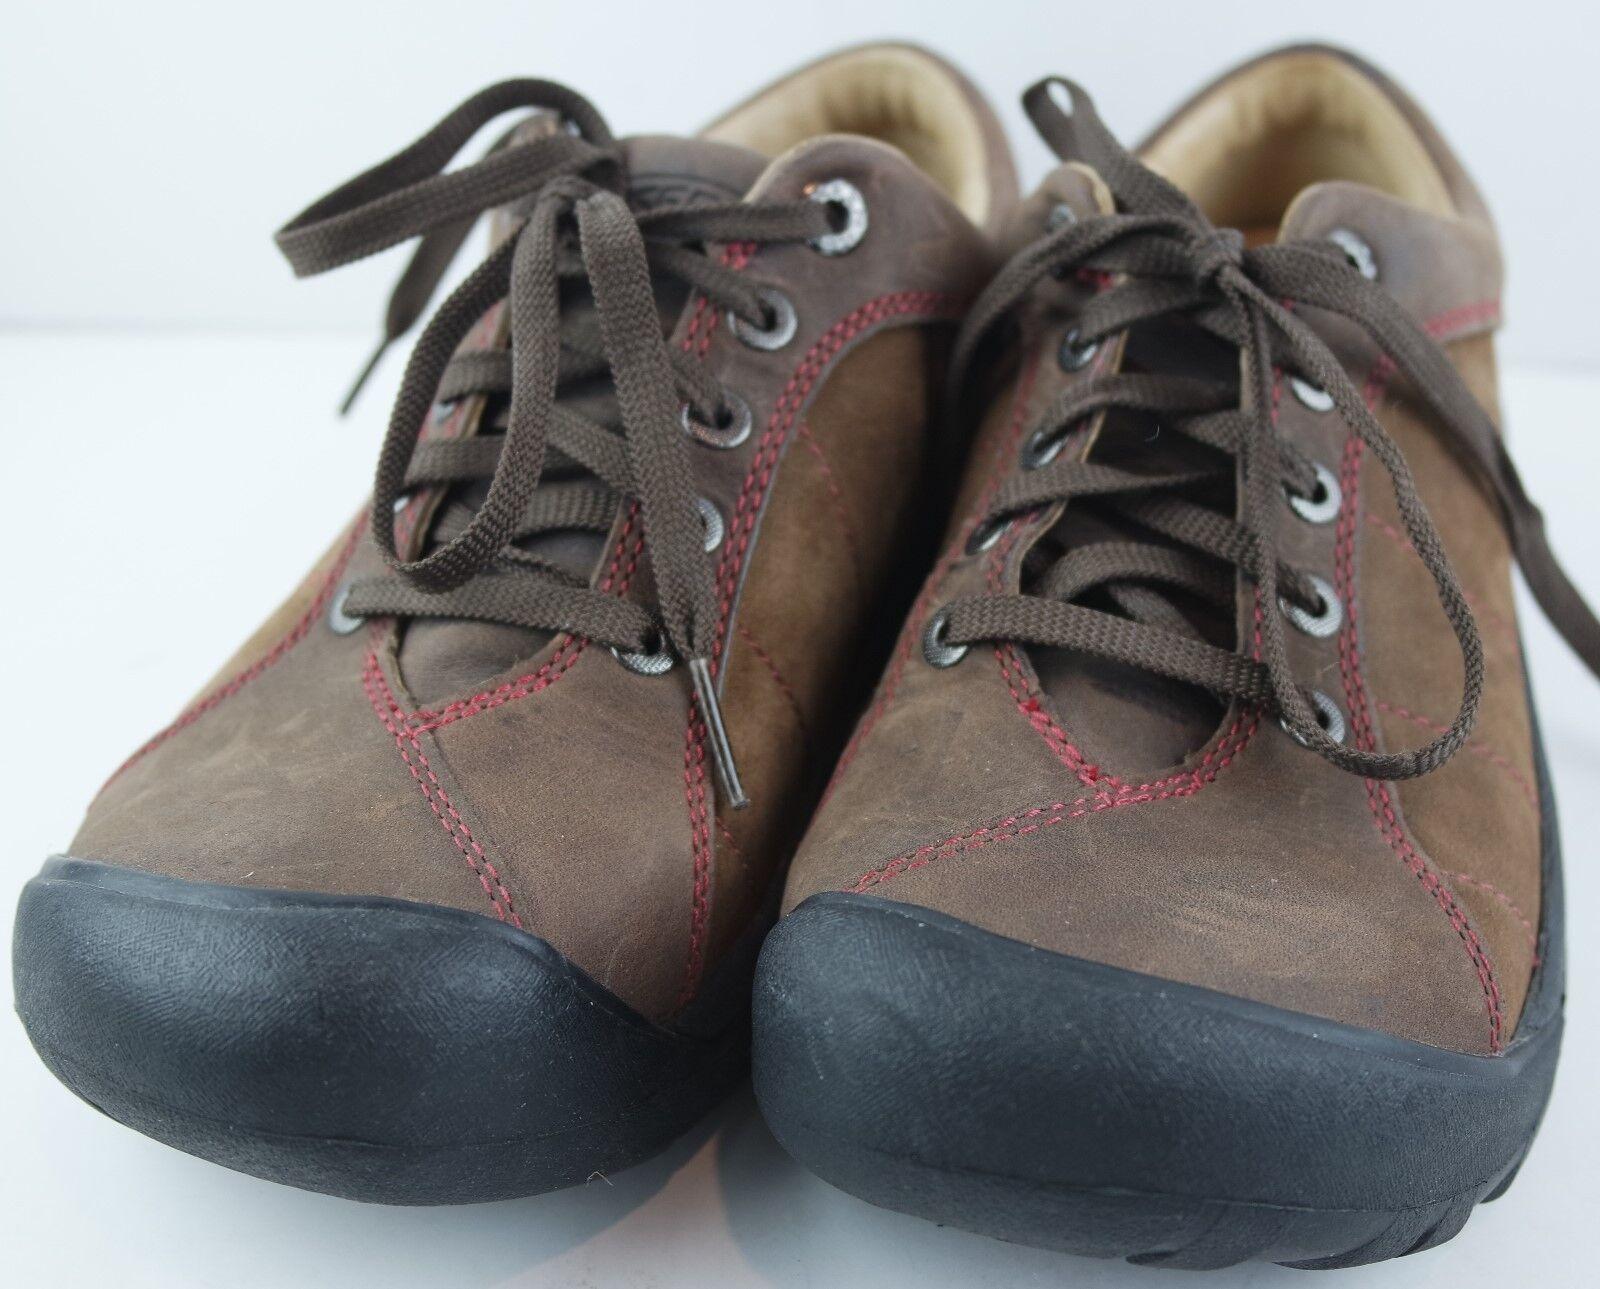 KEEN Women's Presidio Brown Hiking Walking Sneakers  Size 7.5 M  60% off